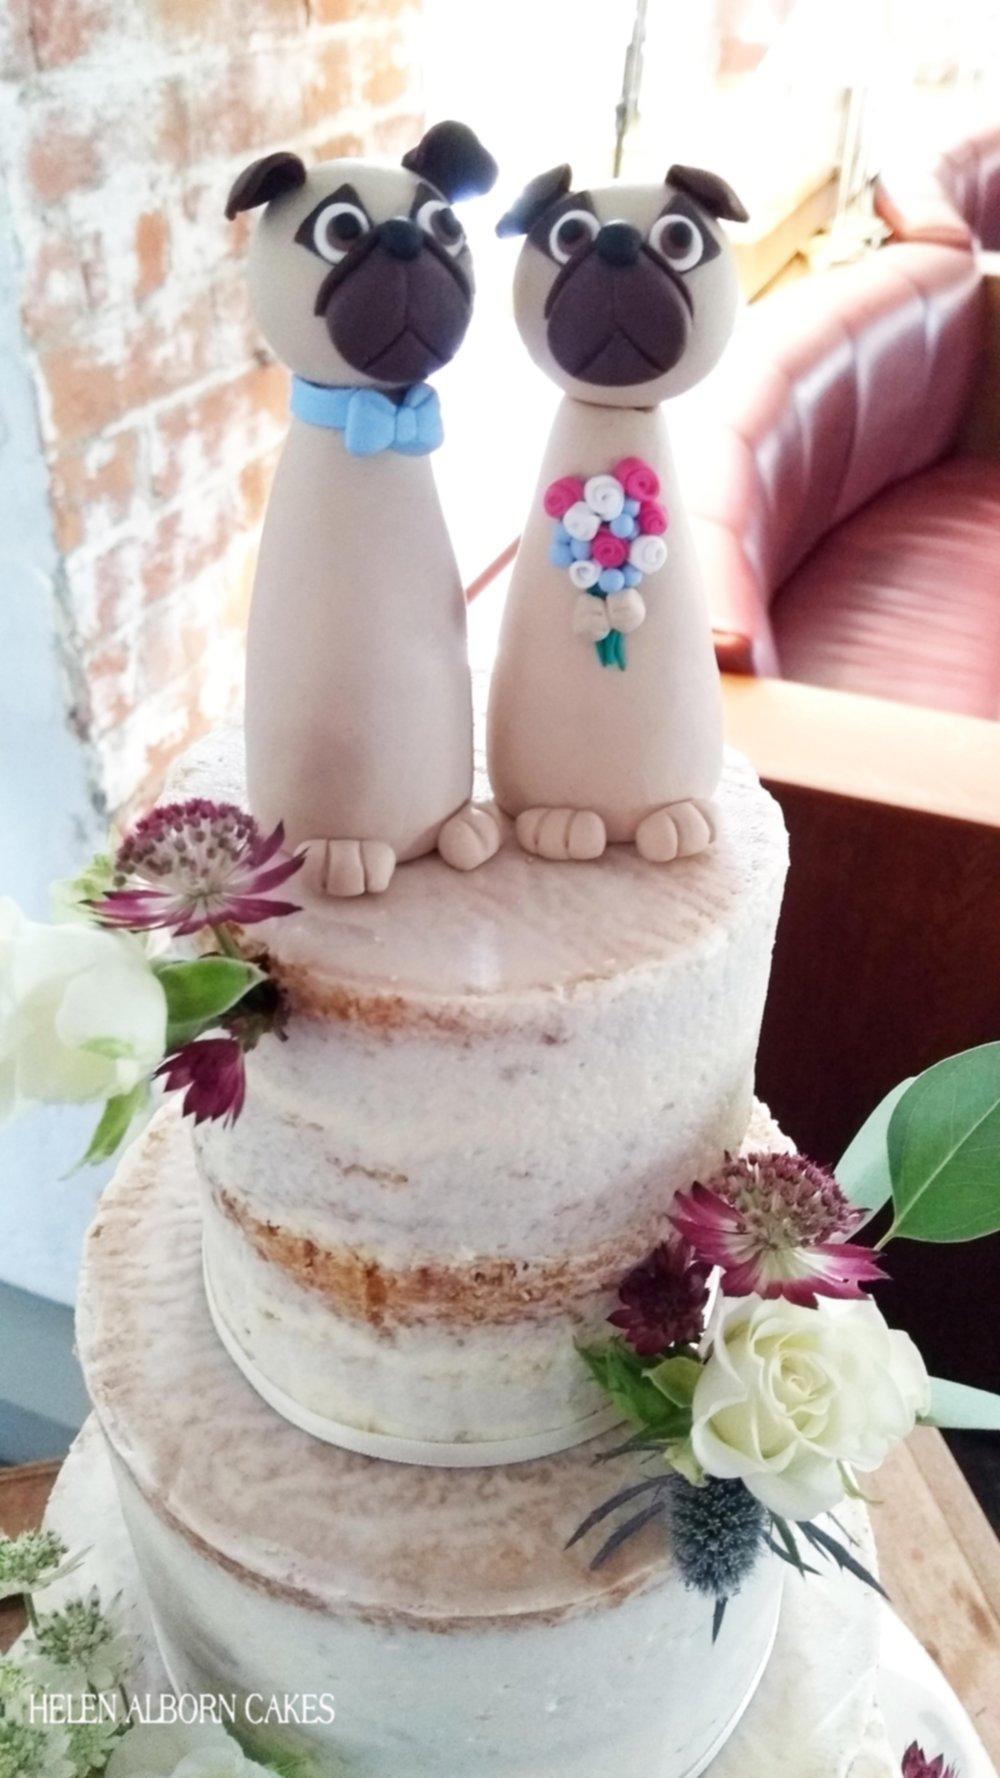 Semi-naked wedding cake with fimo pug dog toppers